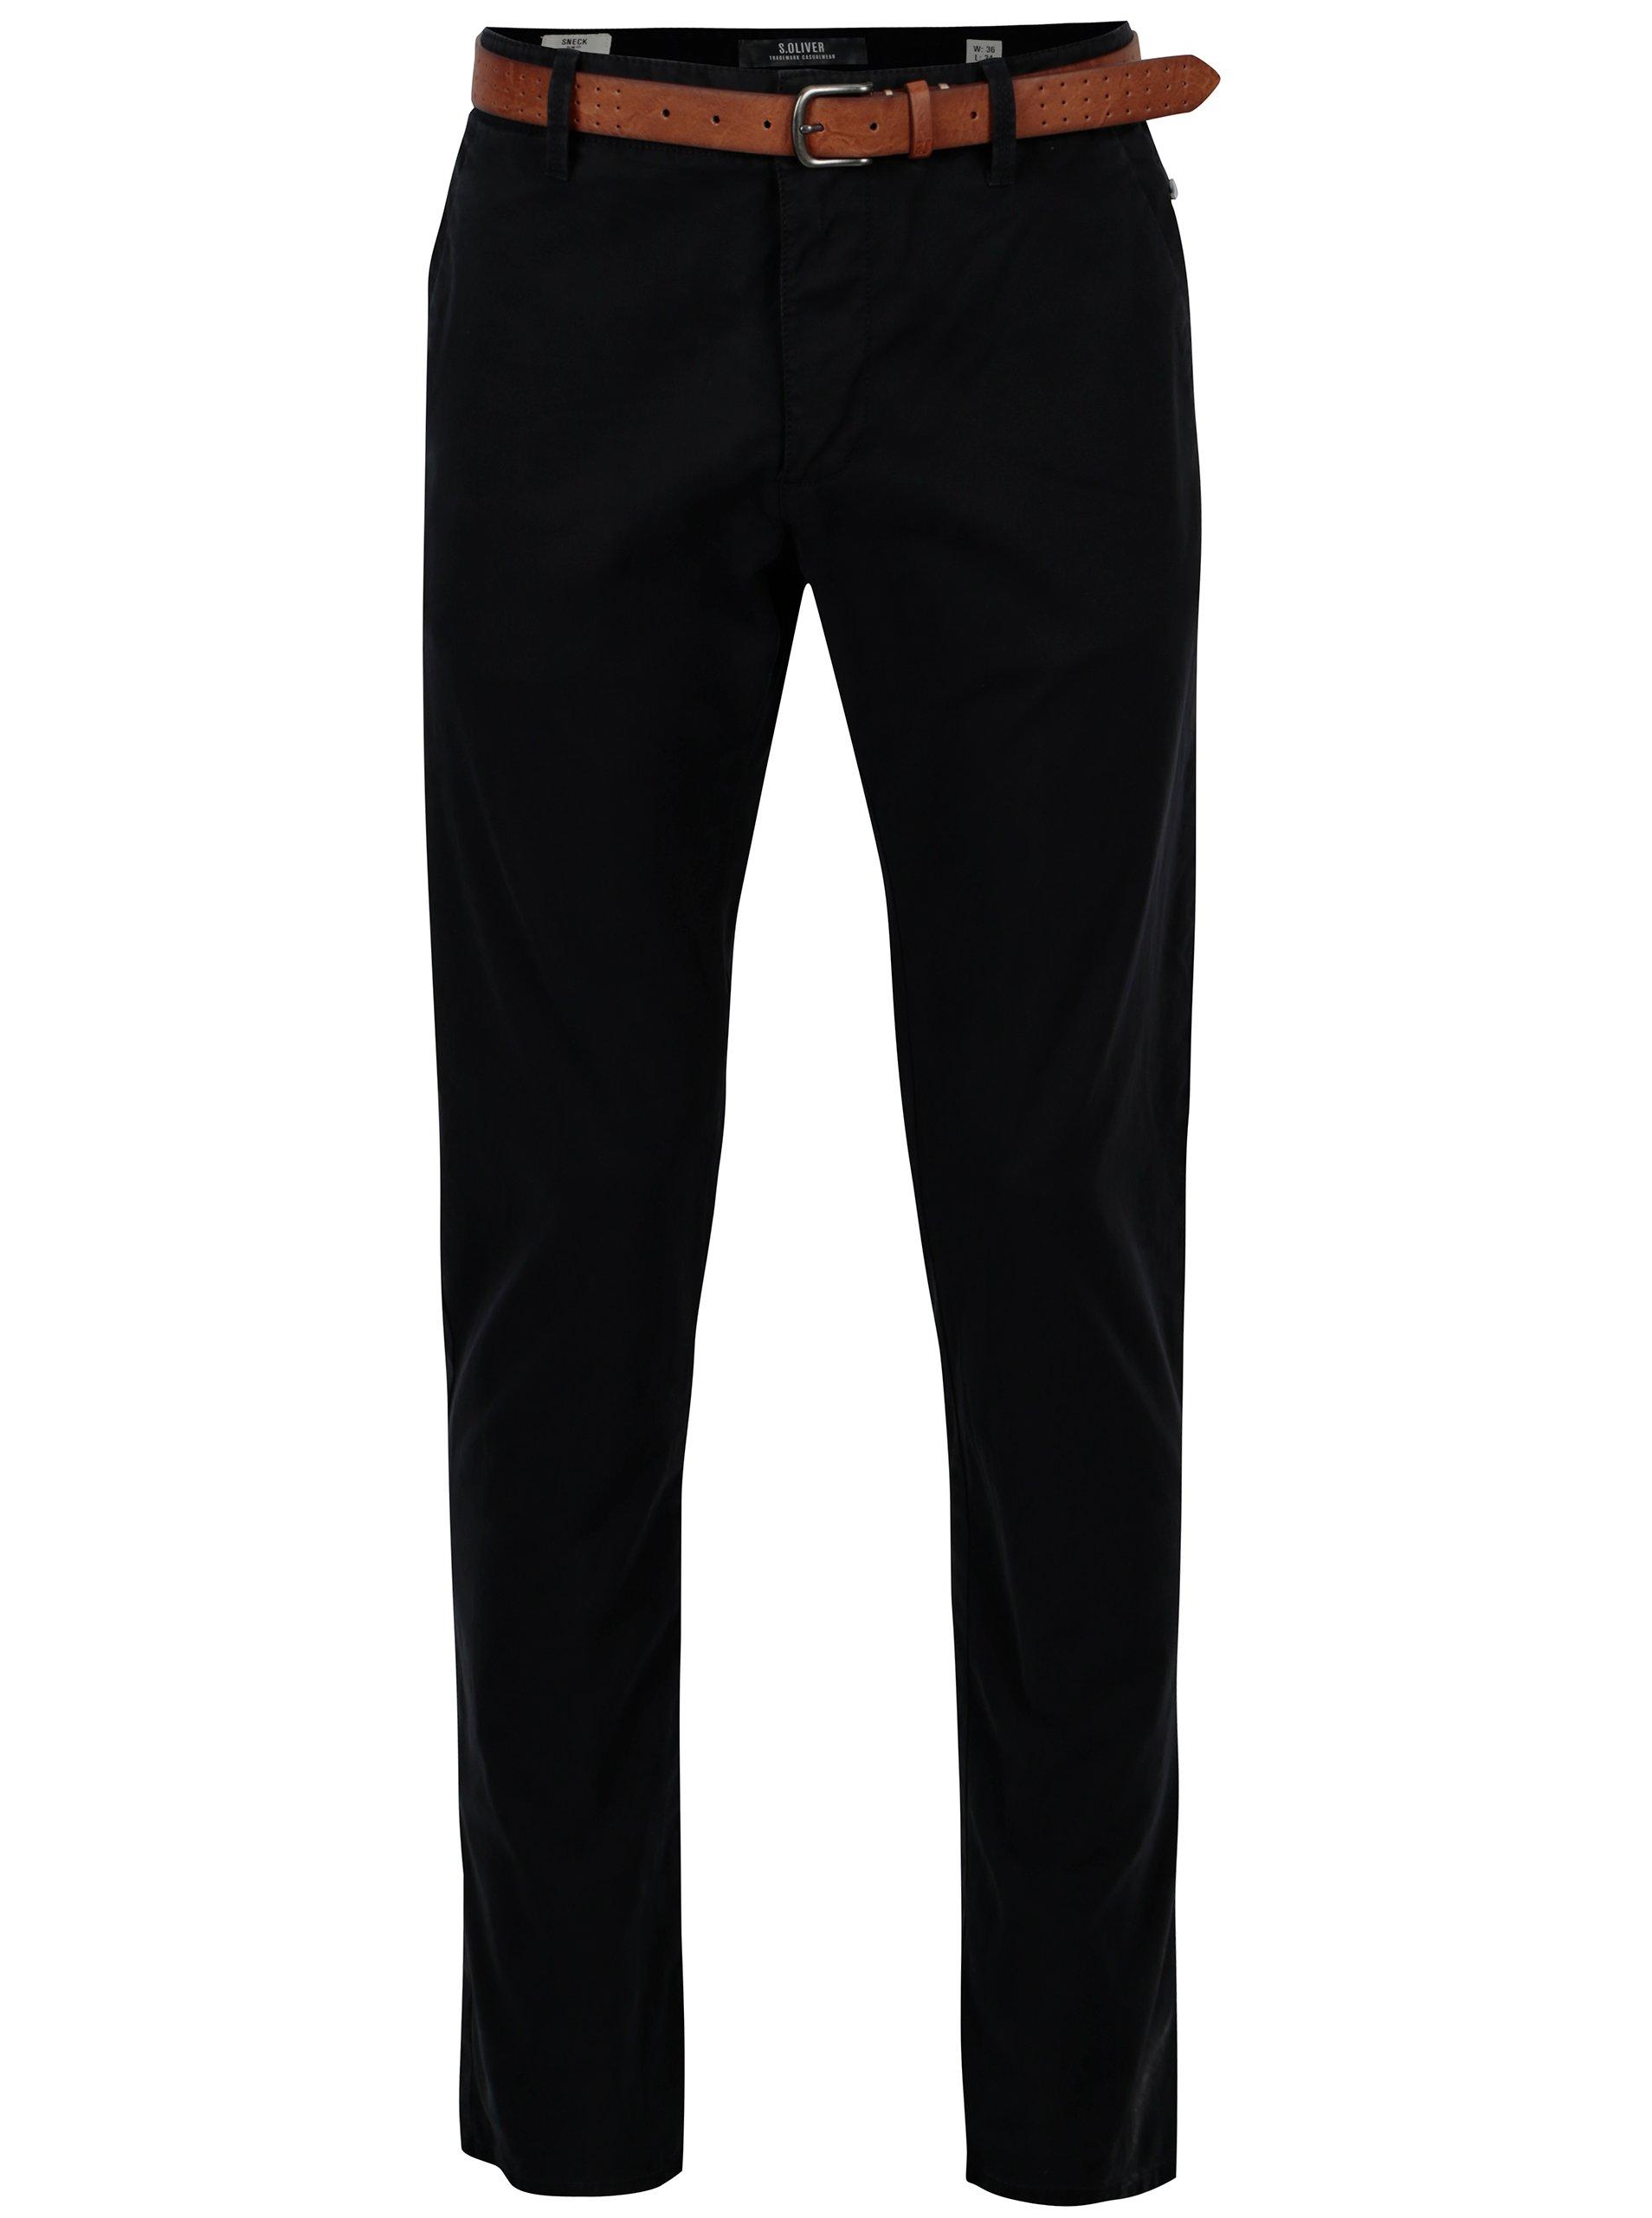 1c33edb0c Tmavomodré pánske slim fit chino nohavice s opaskom s.Oliver | Moda.sk